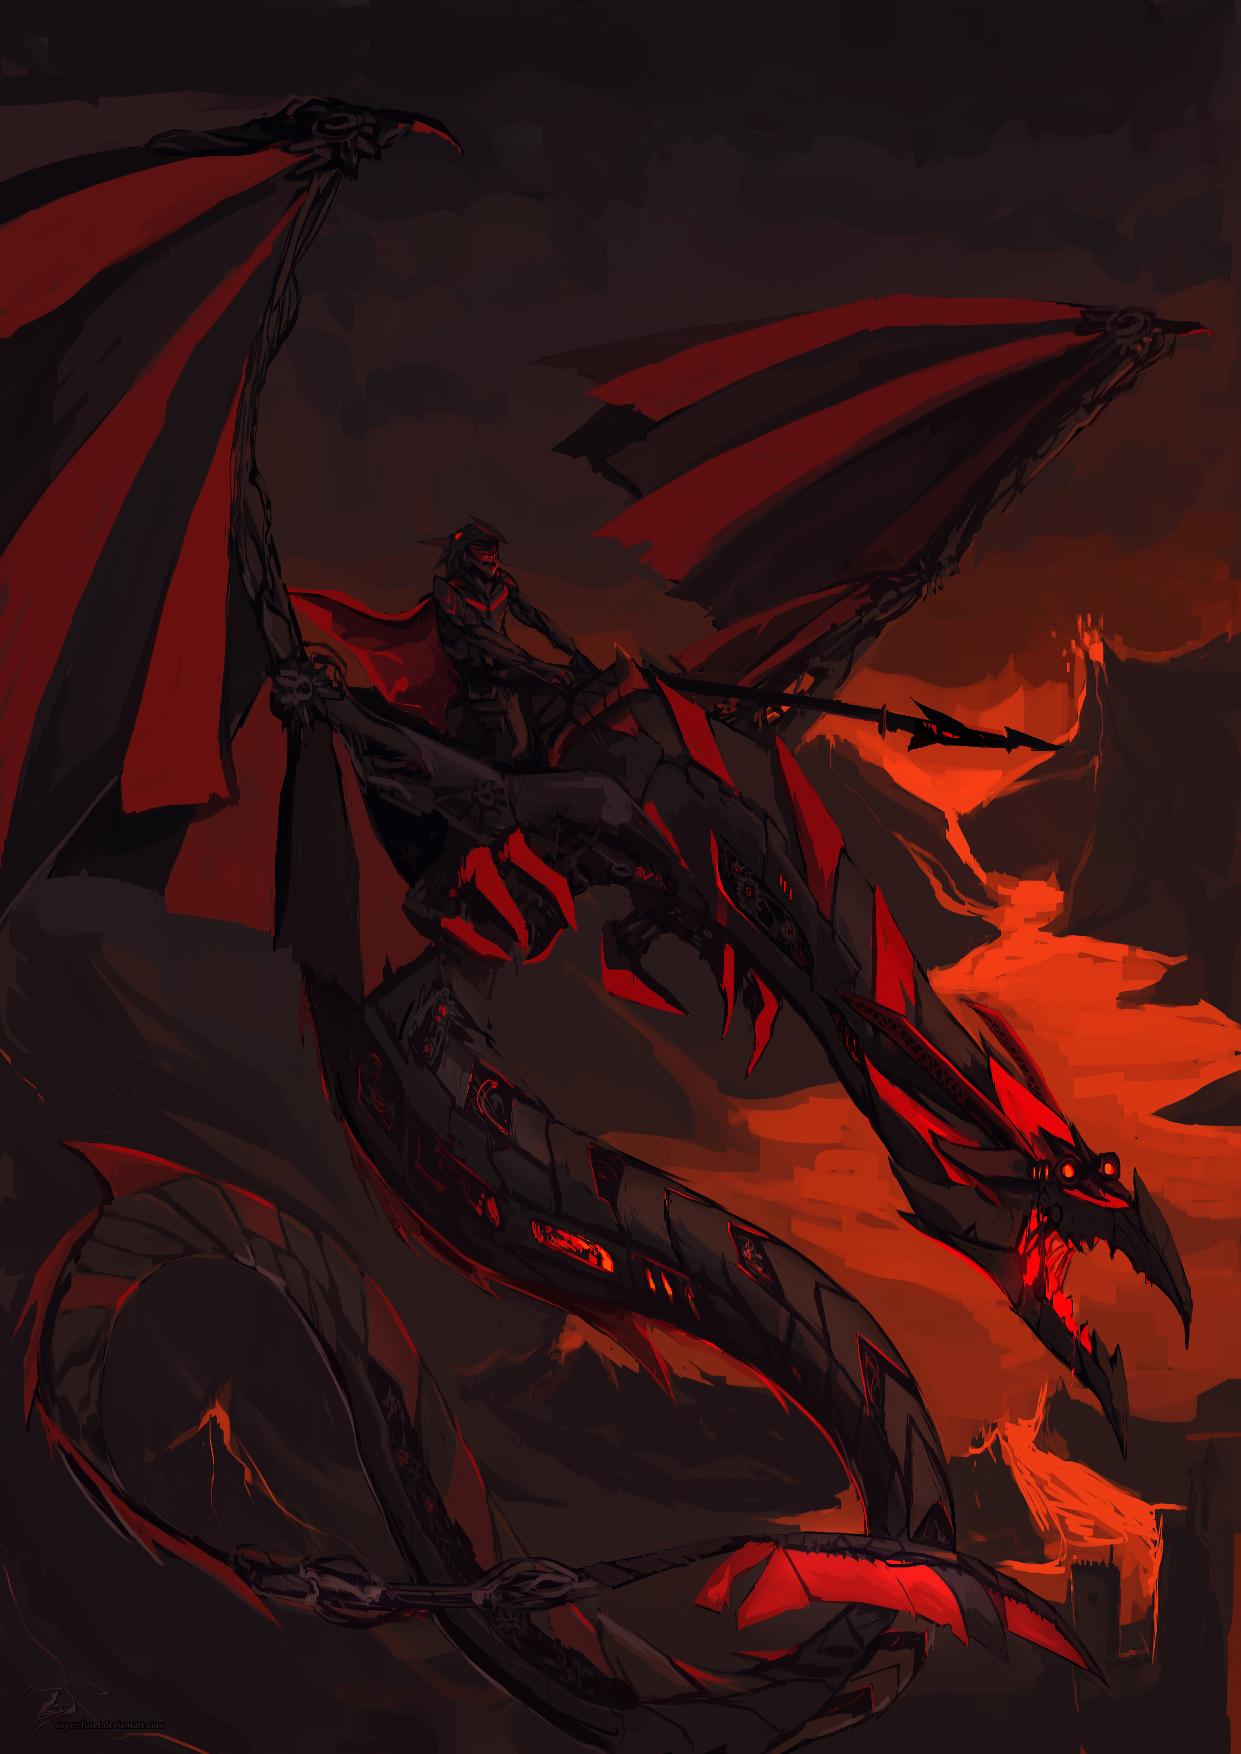 Dragon Rider by Super-Furet